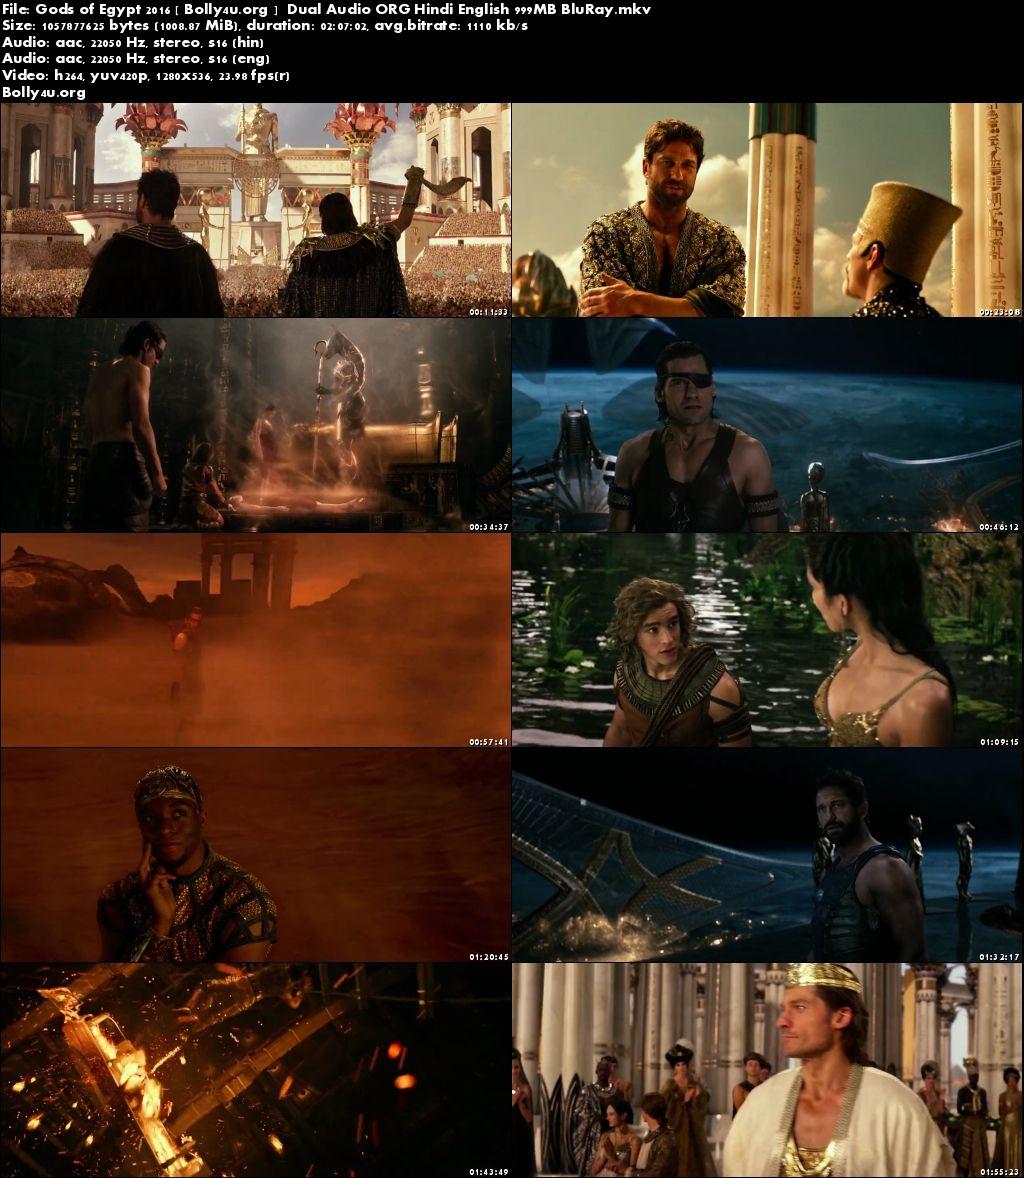 Gods of Egypt 2016 BluRay 999Mb Hindi Dual Audio ORG 720p Download